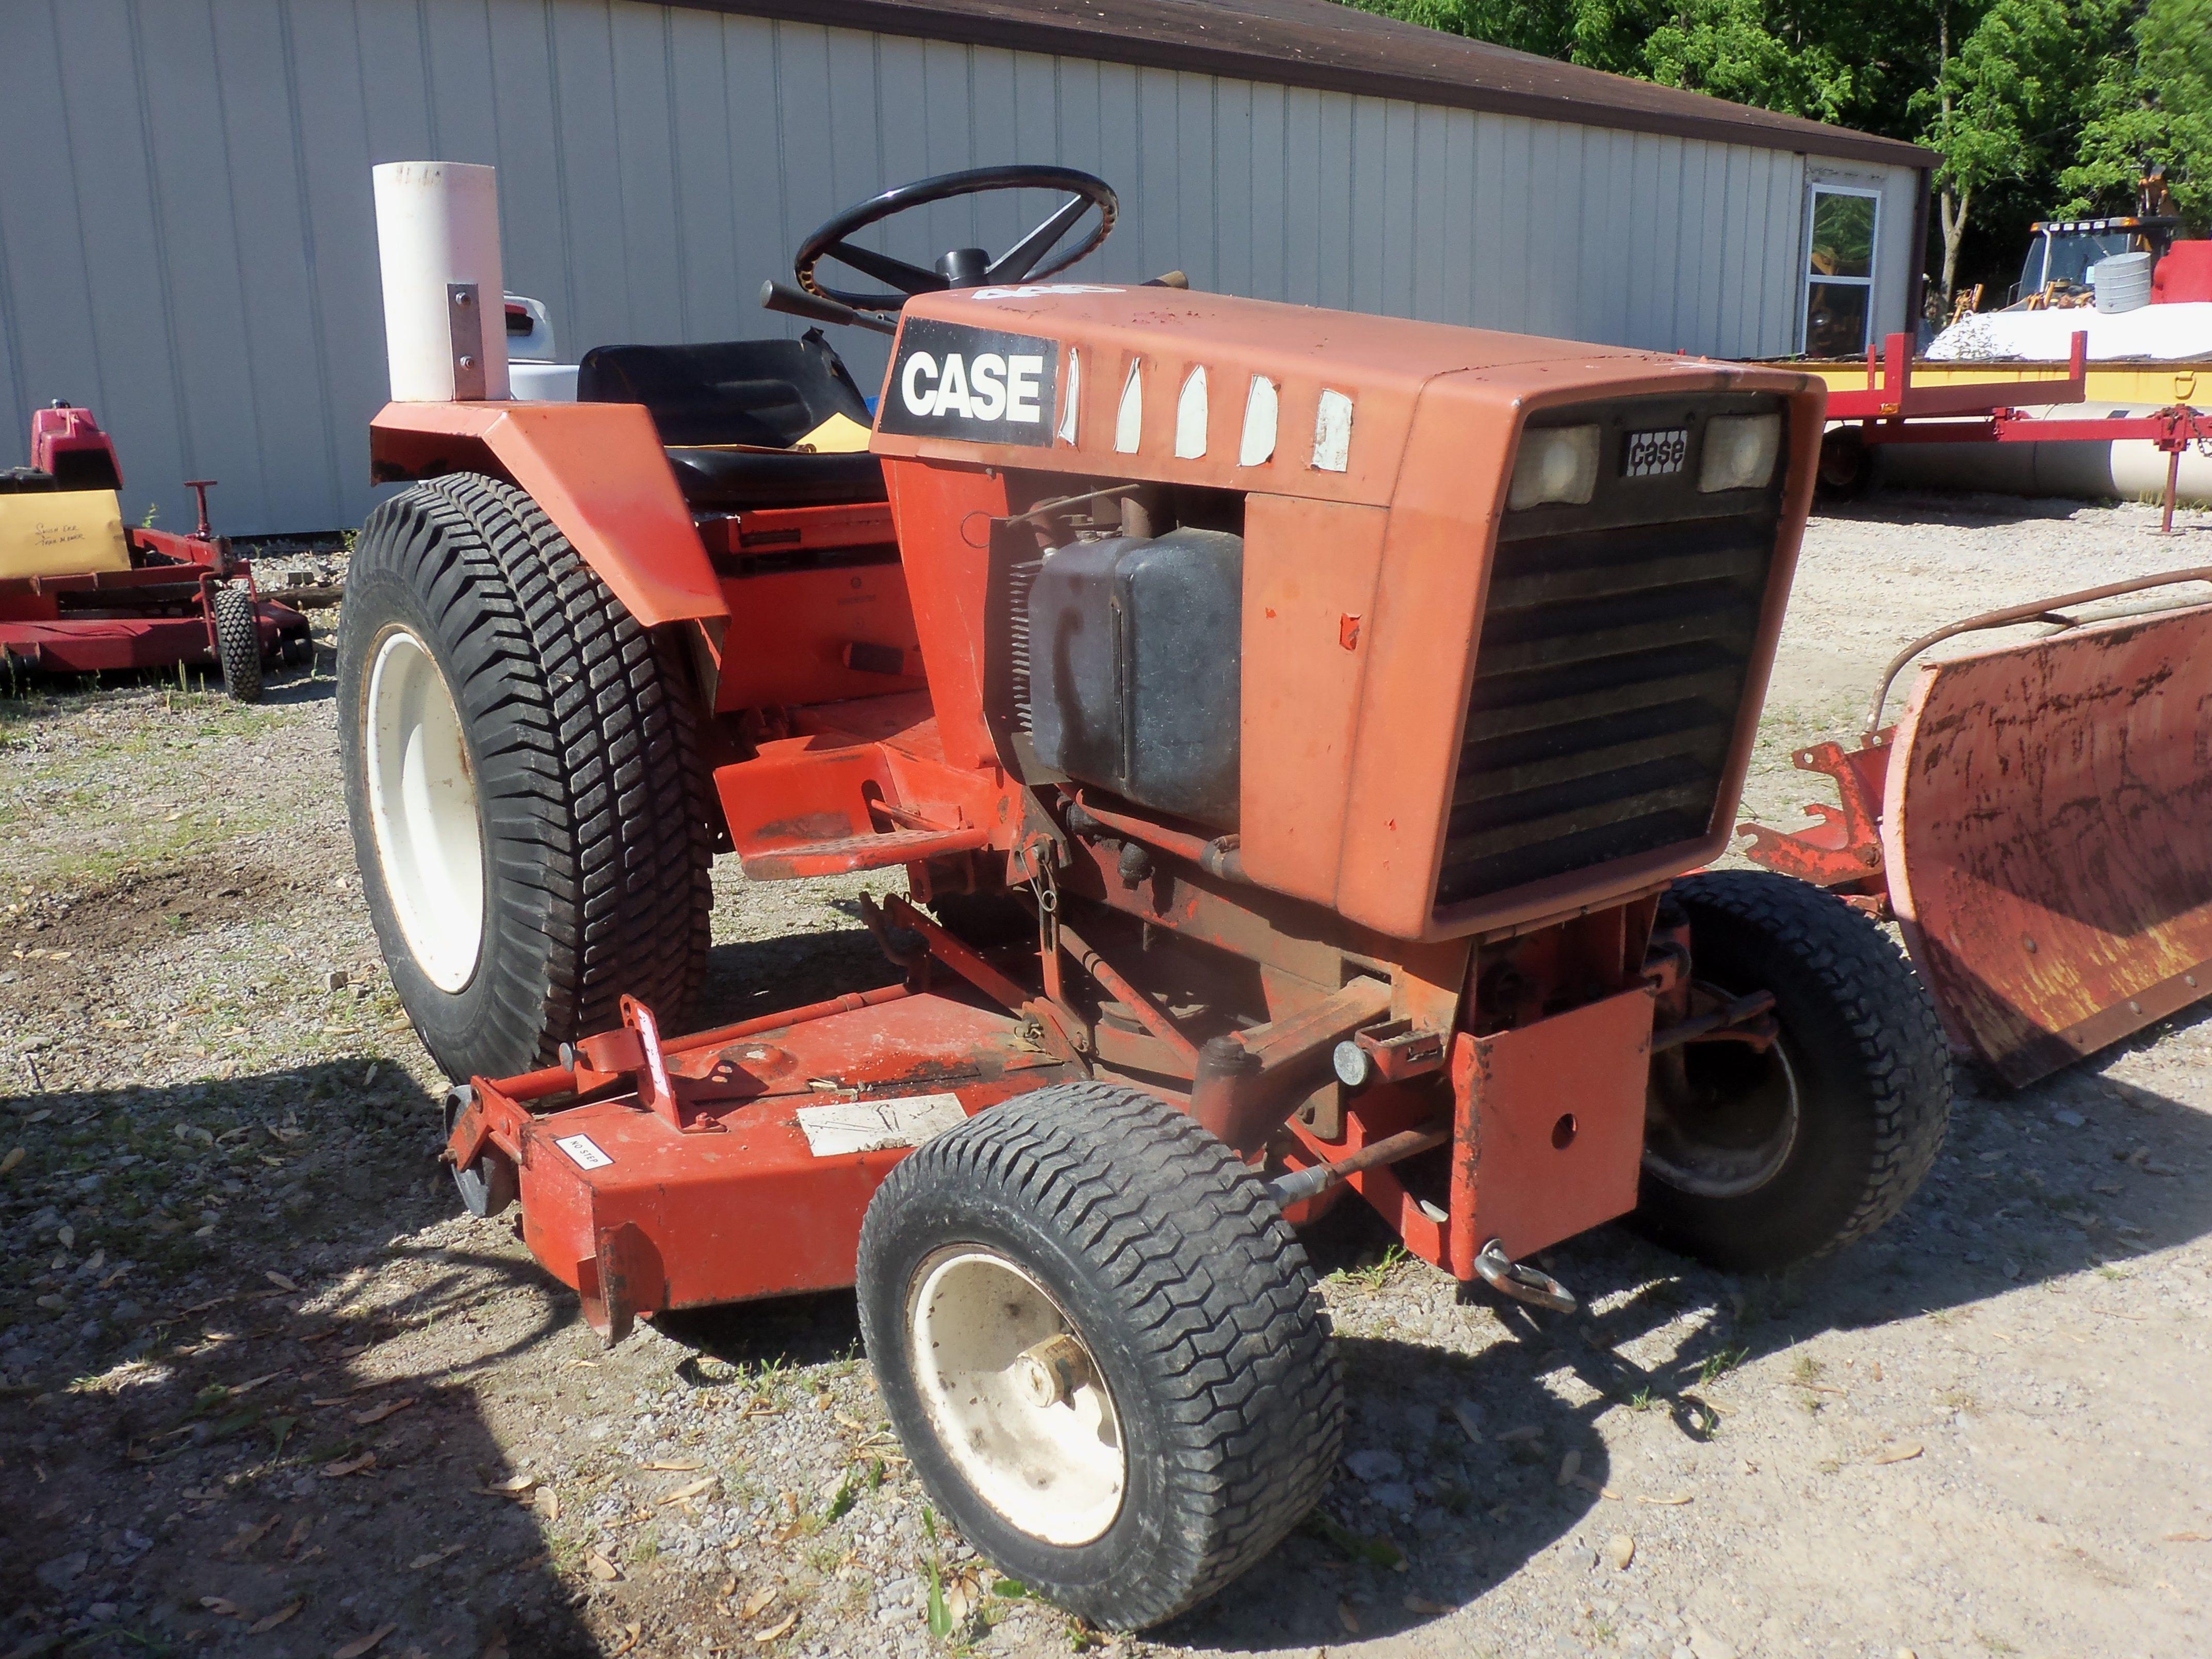 Case garden tractor i case equipment pinterest tractor jpg 4288x3216 Case  446 tractor attachments